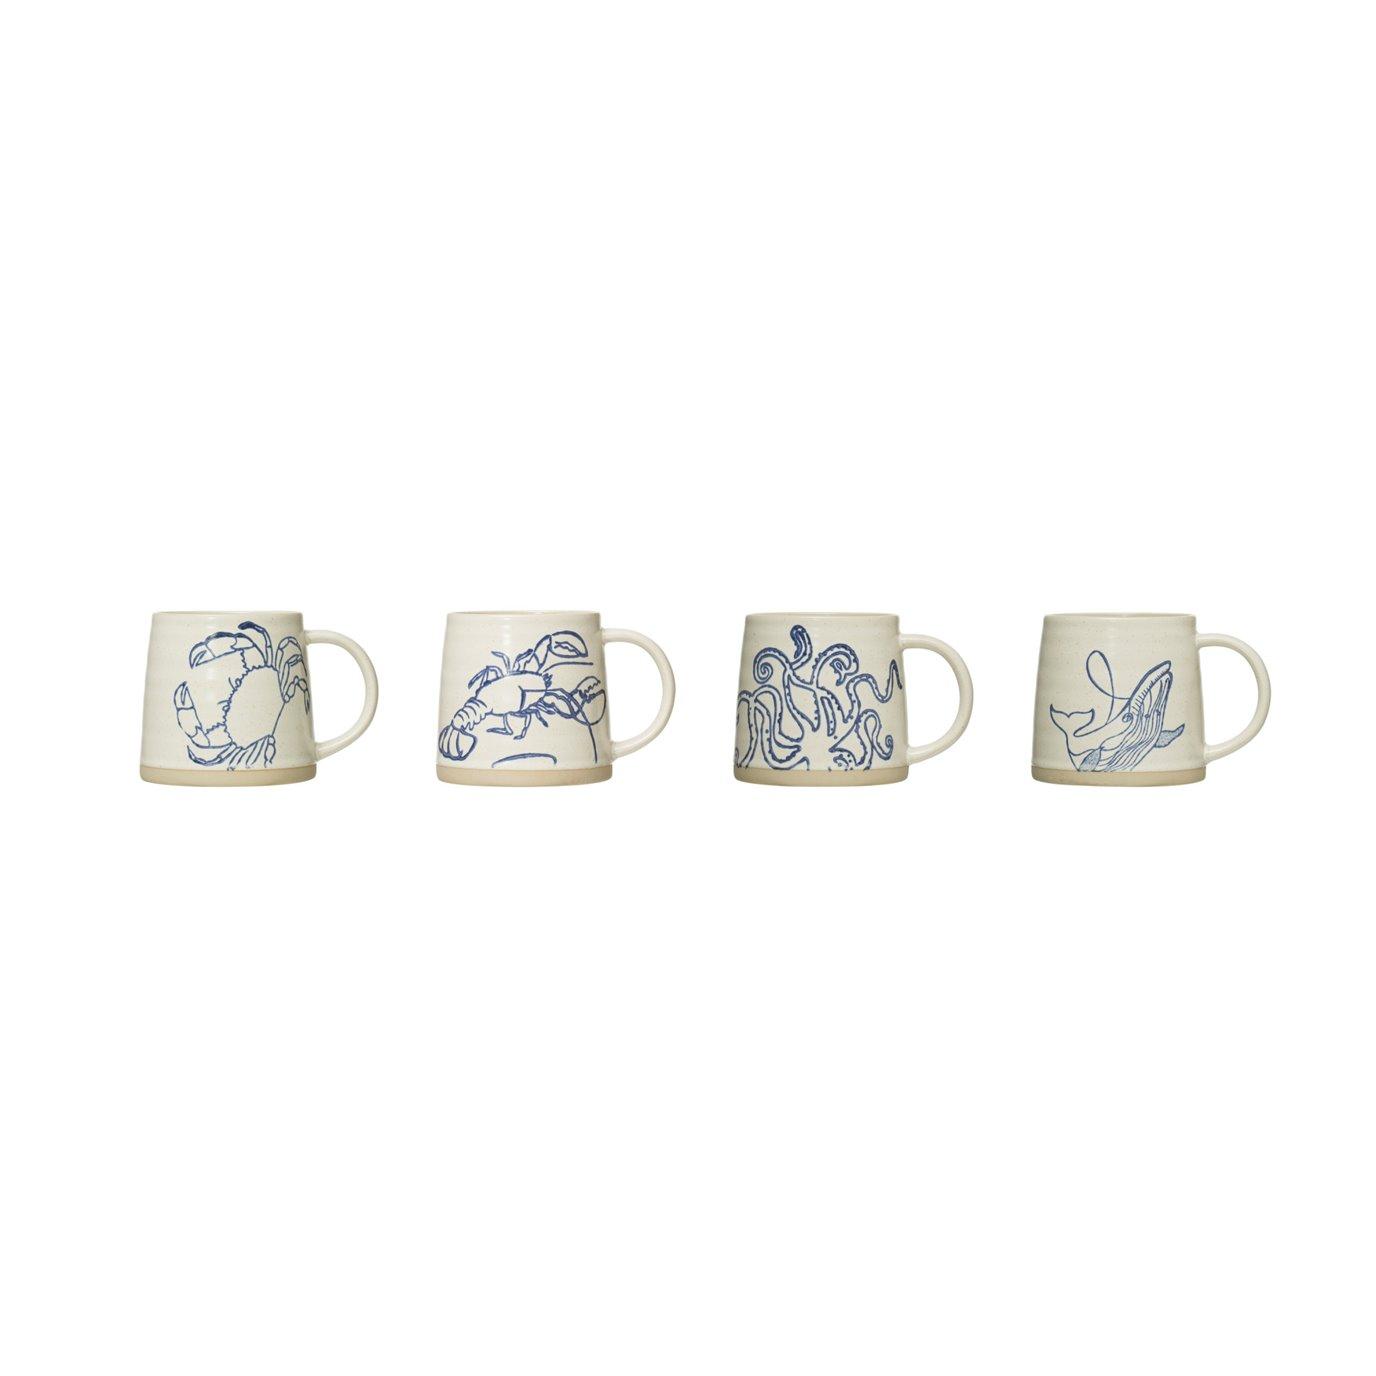 12 oz. Hand-Painted Stoneware Clay Mug (Set of 4 Styles)